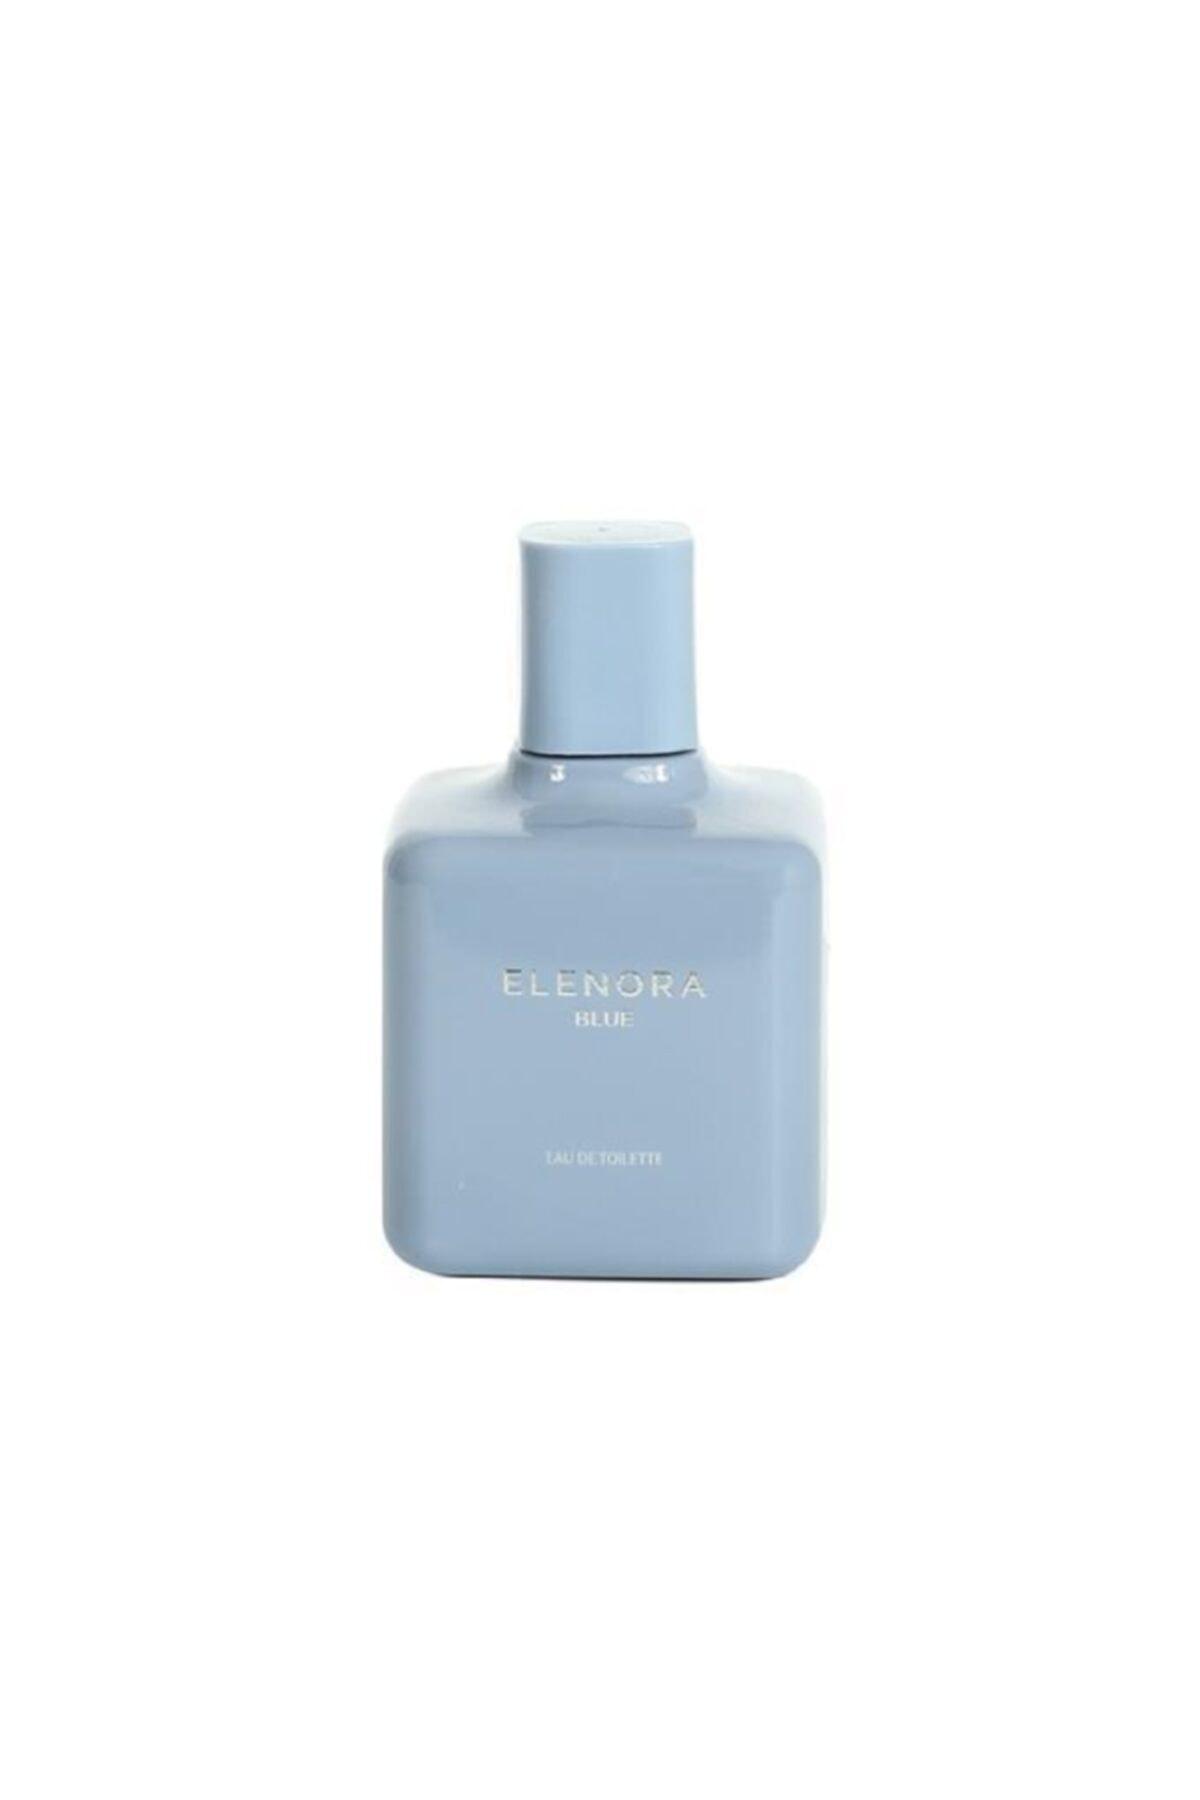 Collezione Elenora Blue Kadın Parfümü Edt 100 Ml 1